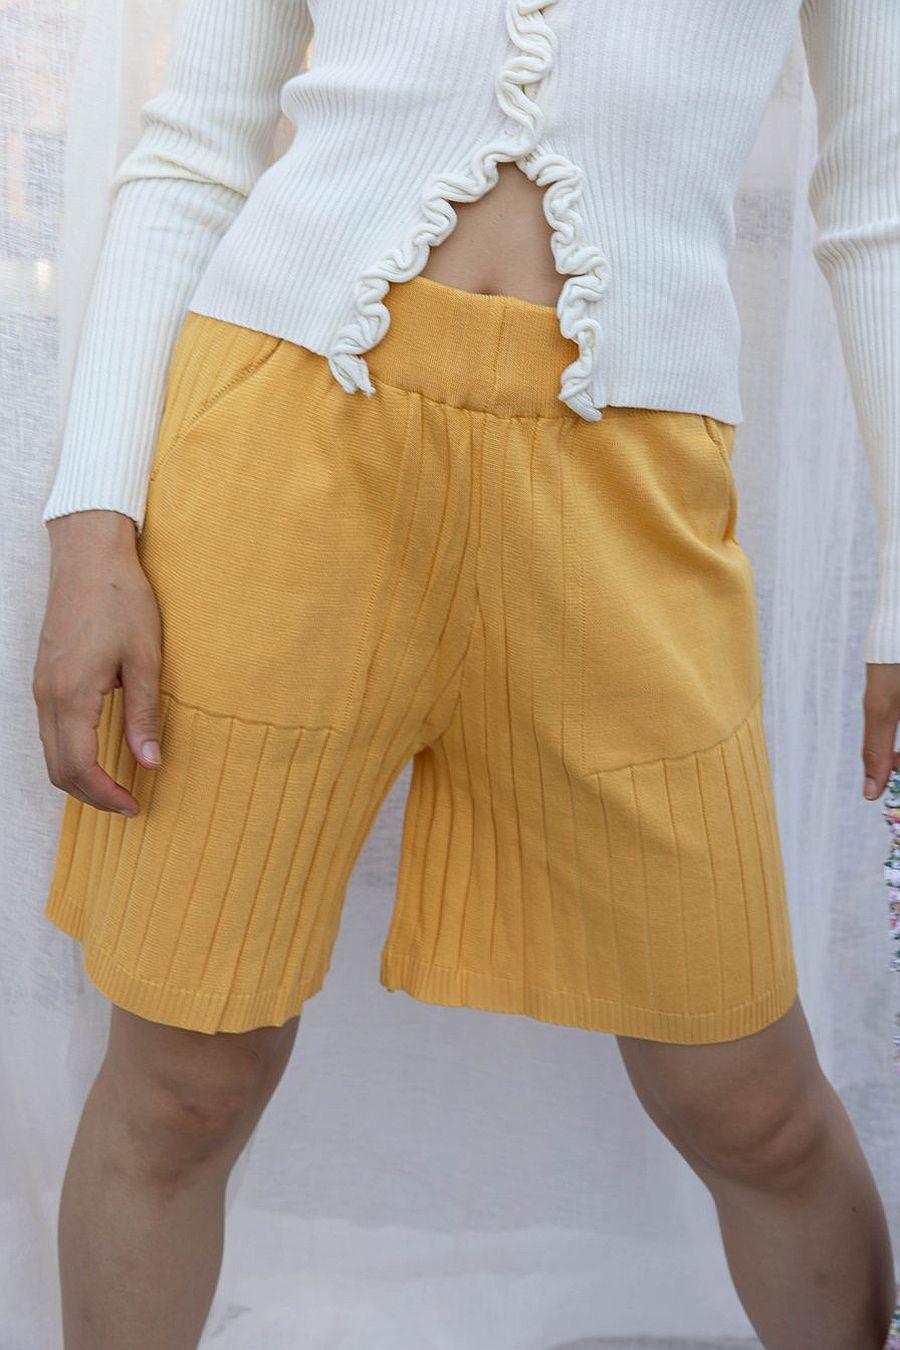 Find Me Now Dakota Ribbed Short - Yellow